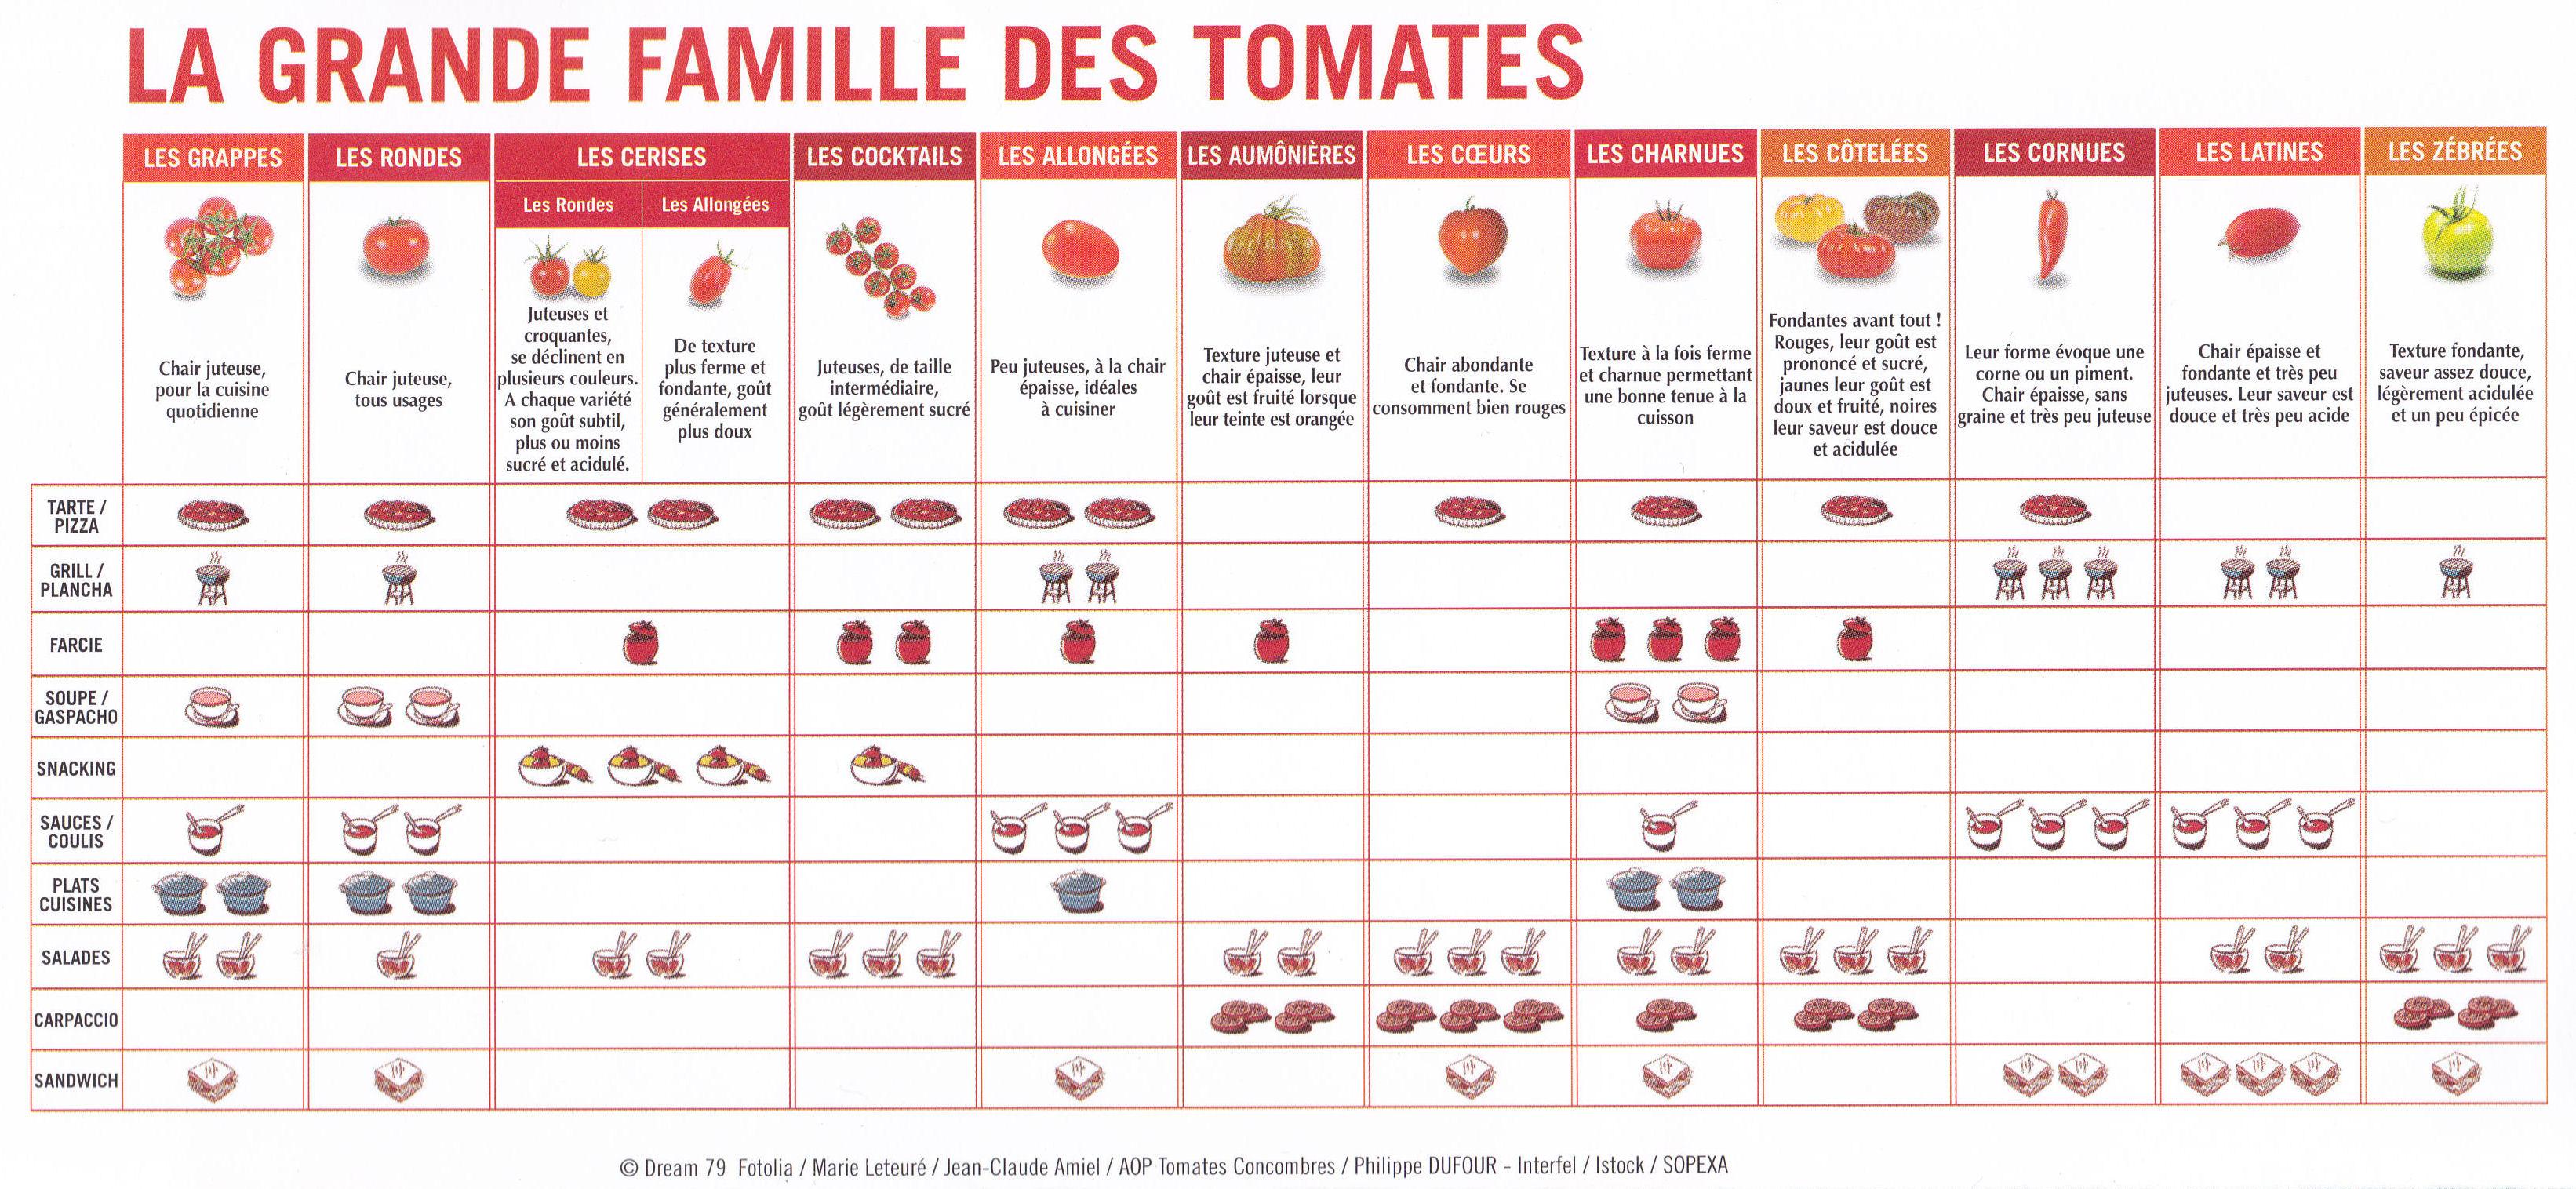 Usage tomates grande famille